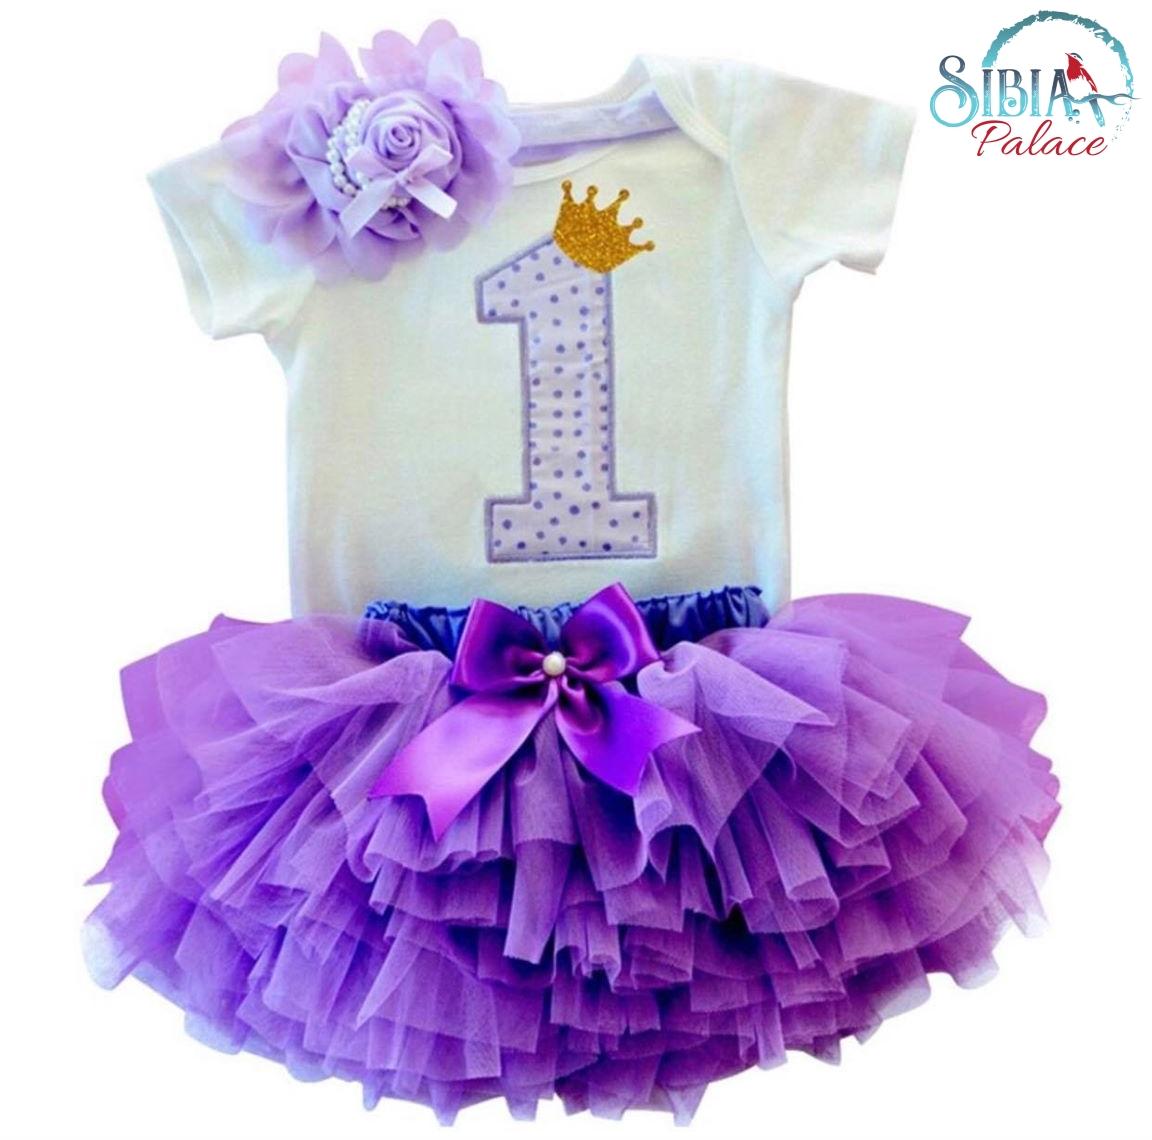 65e627469a29e Sibia Palace Baby Girl 1st Birthday Princess Theme Purple Glitter Outfits